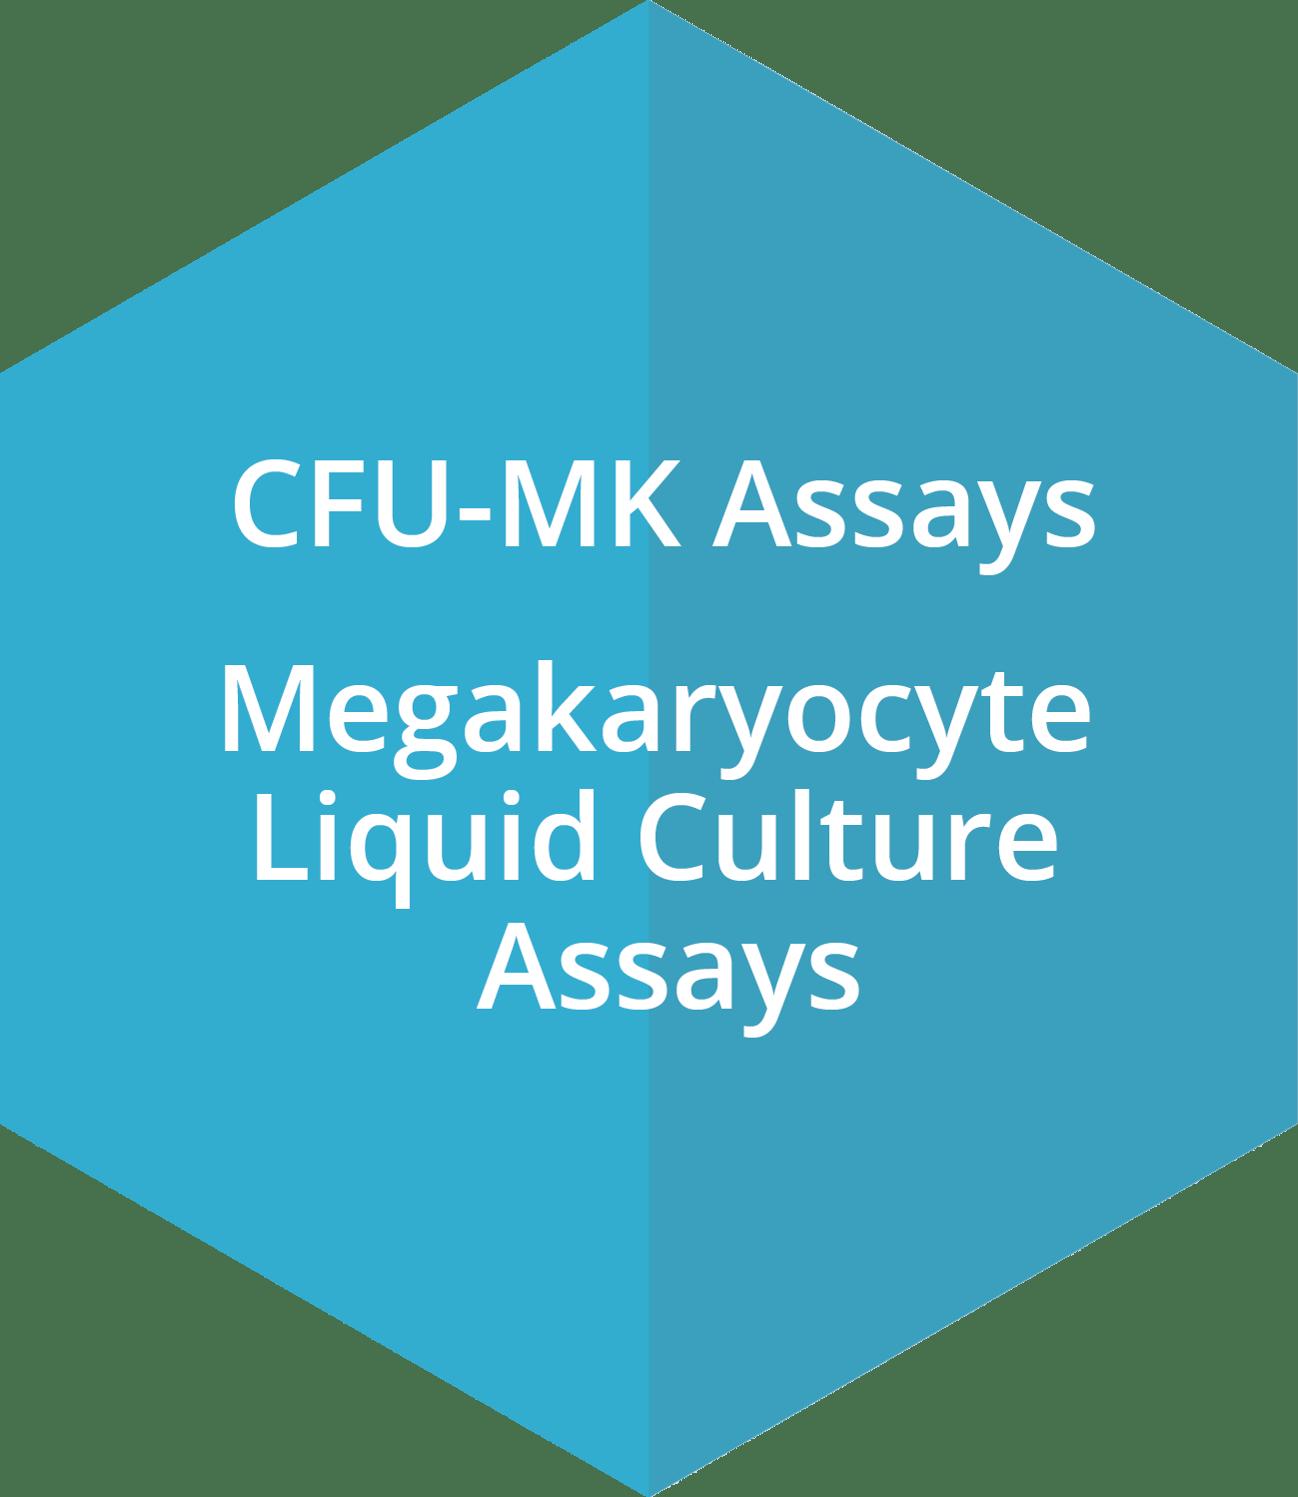 CFU-MK assays, Megakaryocyte Liquid Culture Assays